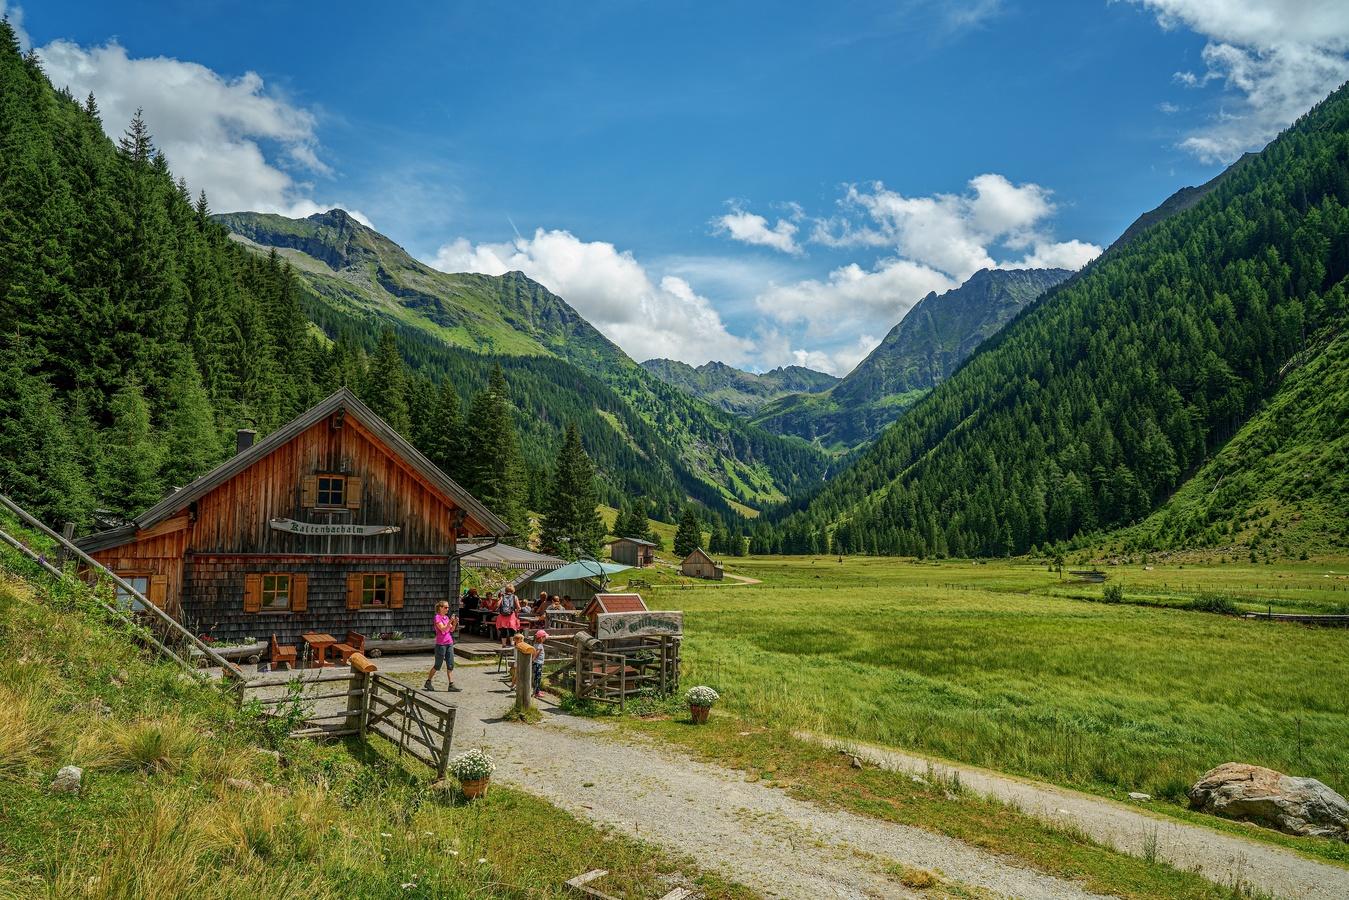 Údolí u jezera Riesachsee